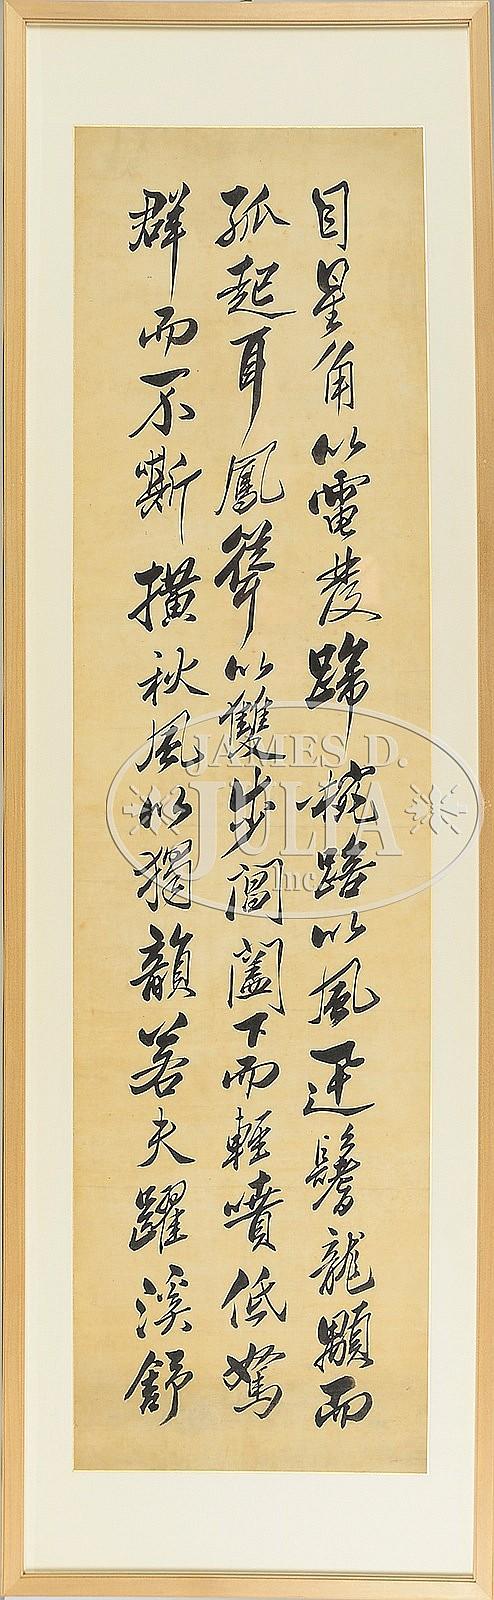 YUN YONG-GU (Korean, 1852-1939) CALLIGRAPHY